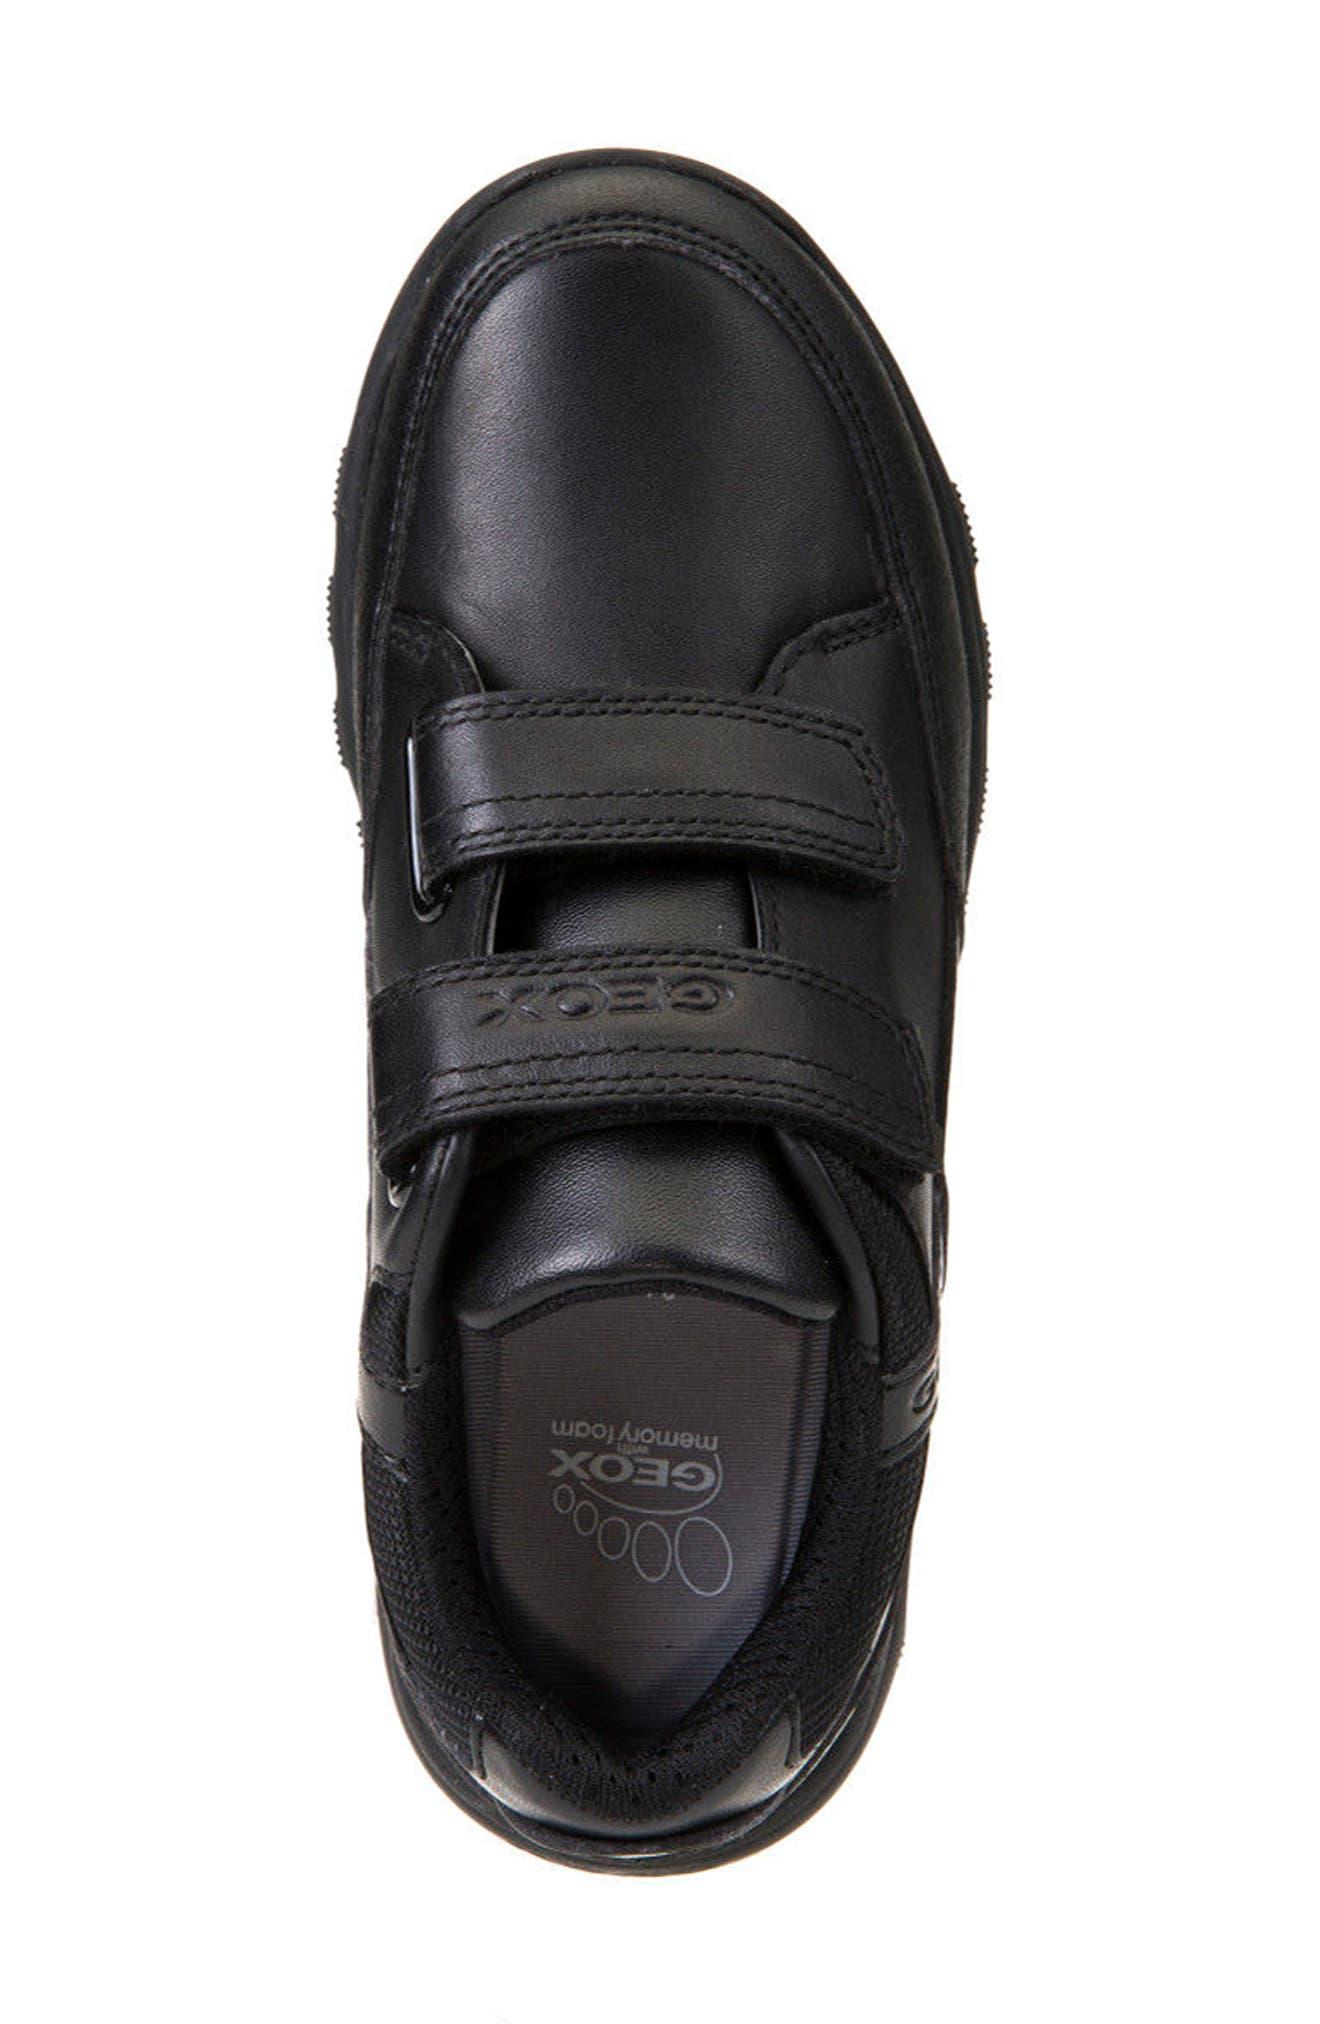 Xunday Low Top Sneaker,                             Alternate thumbnail 5, color,                             BLACK